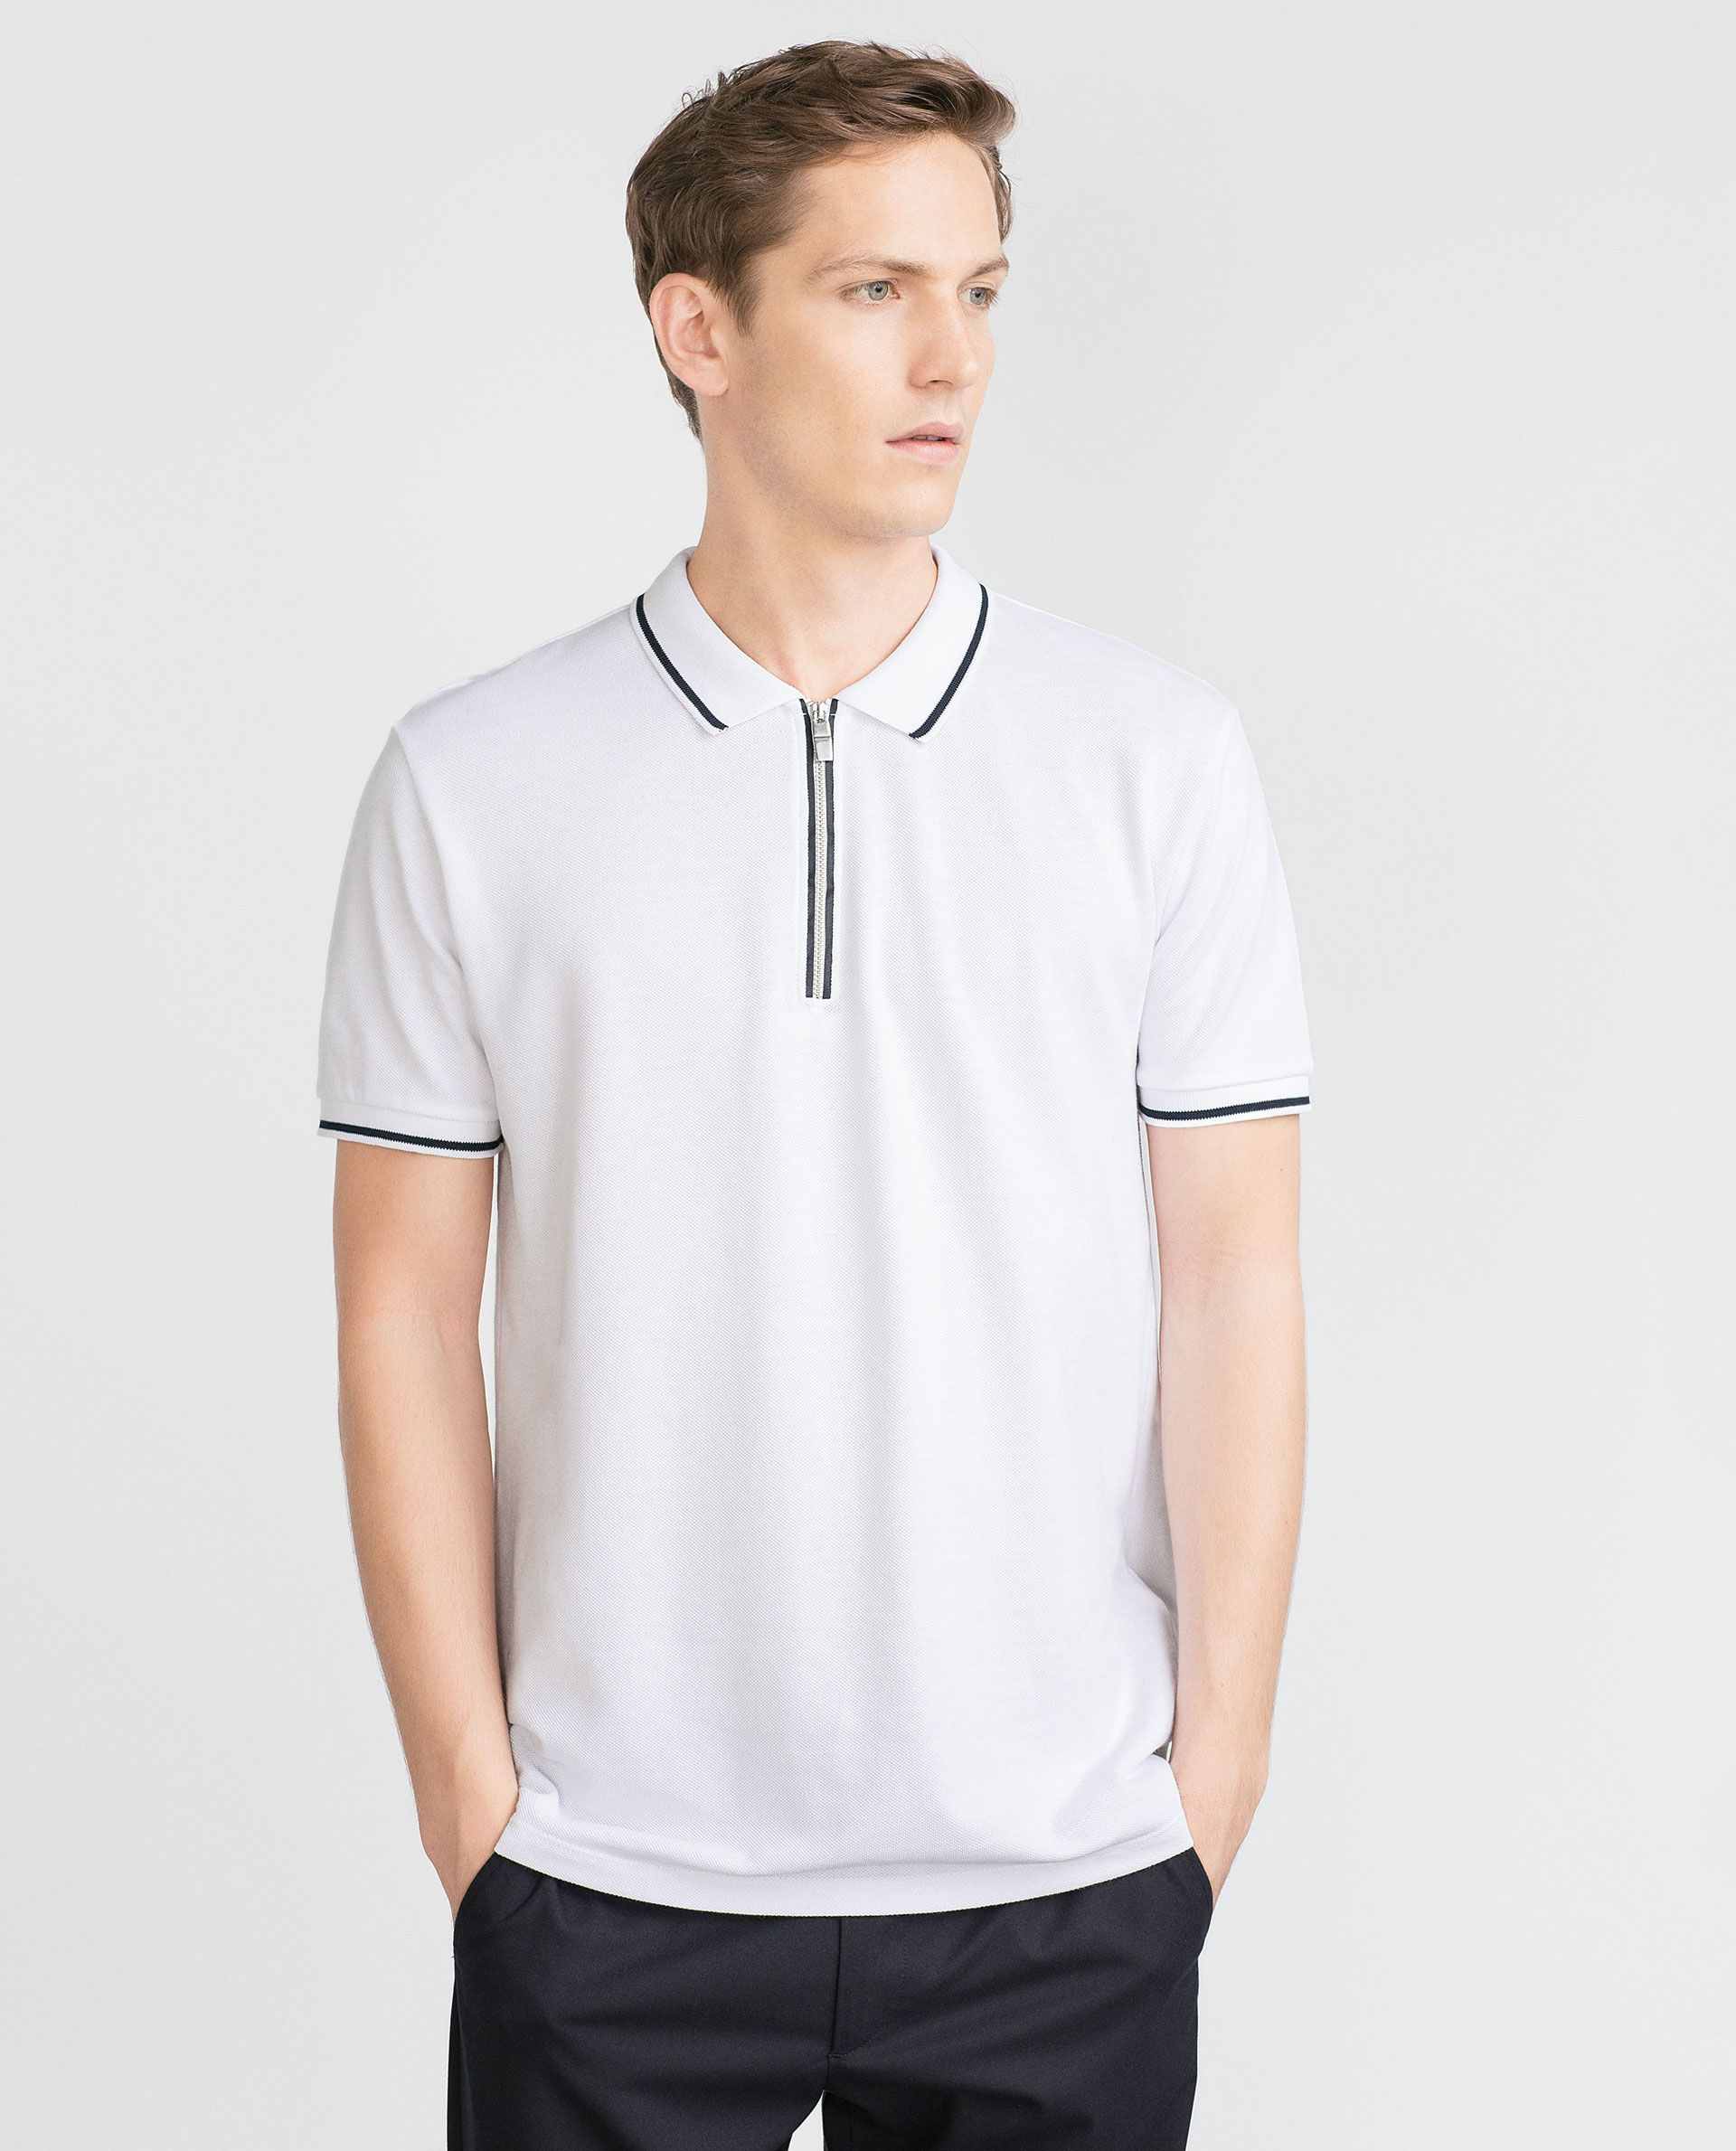 Zara black t shirt india - Polo Shirt With Zip Polo Shirts Man Zara Belgium